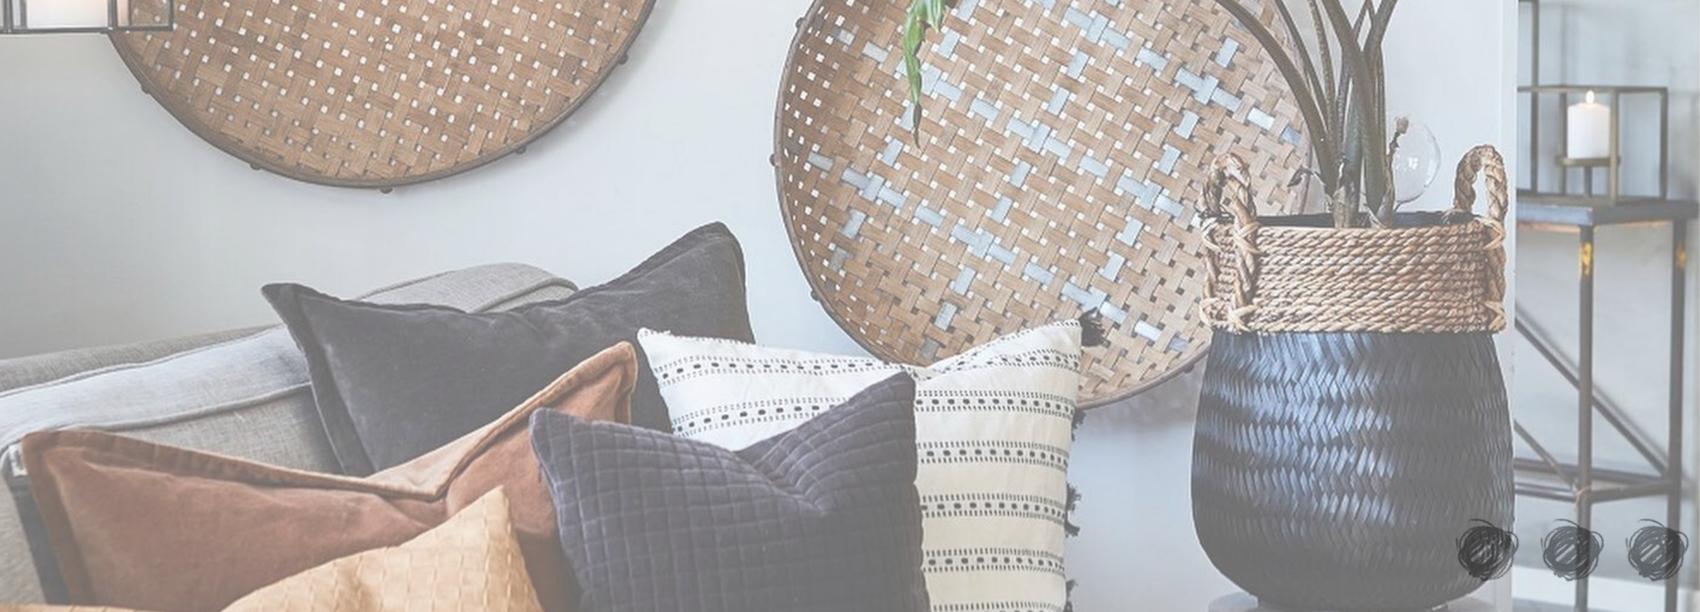 Interiér obývací pokoj | Intuition interiéry